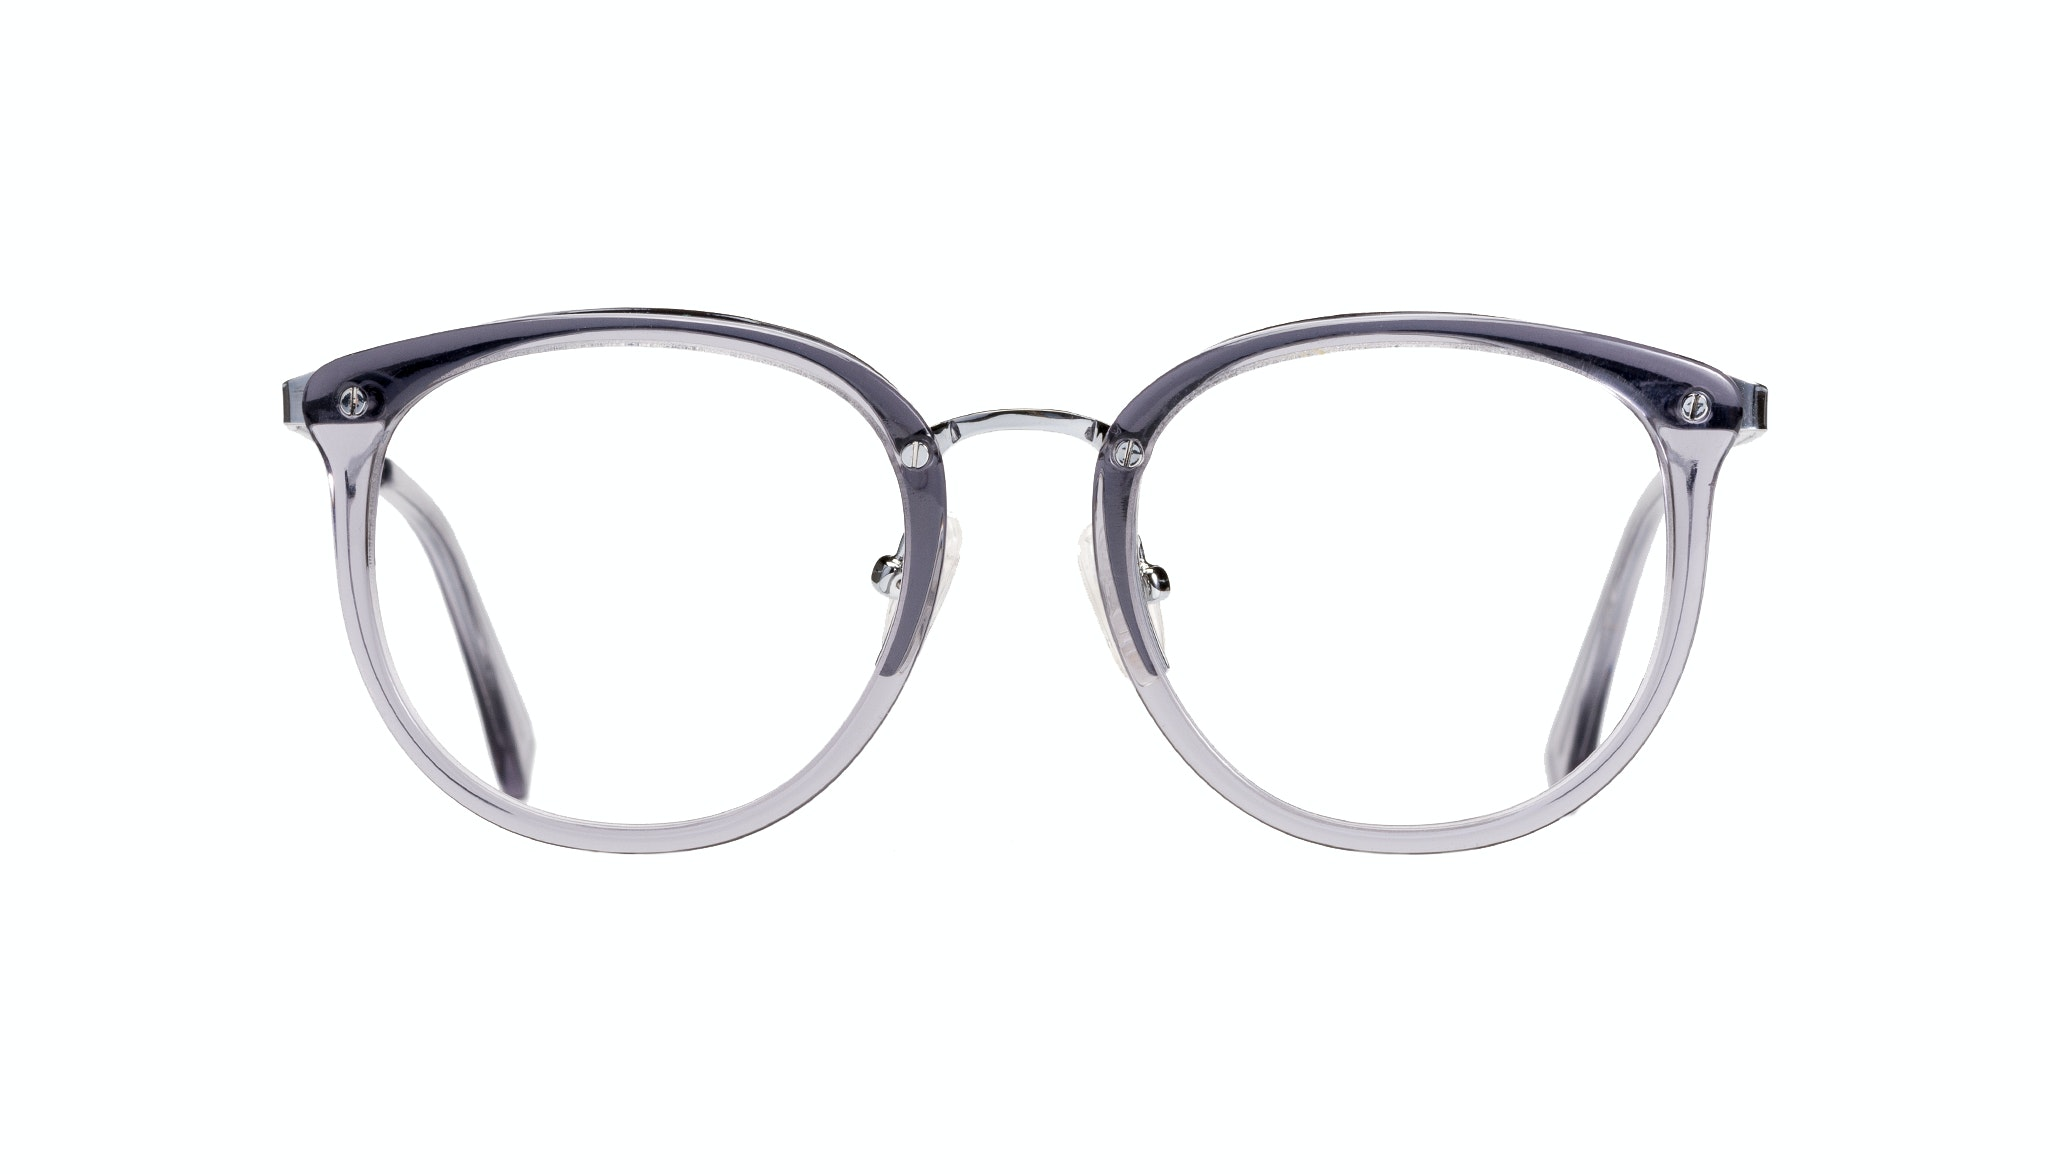 Affordable Fashion Glasses Round Eyeglasses Women Amaze Petite Cloud Front